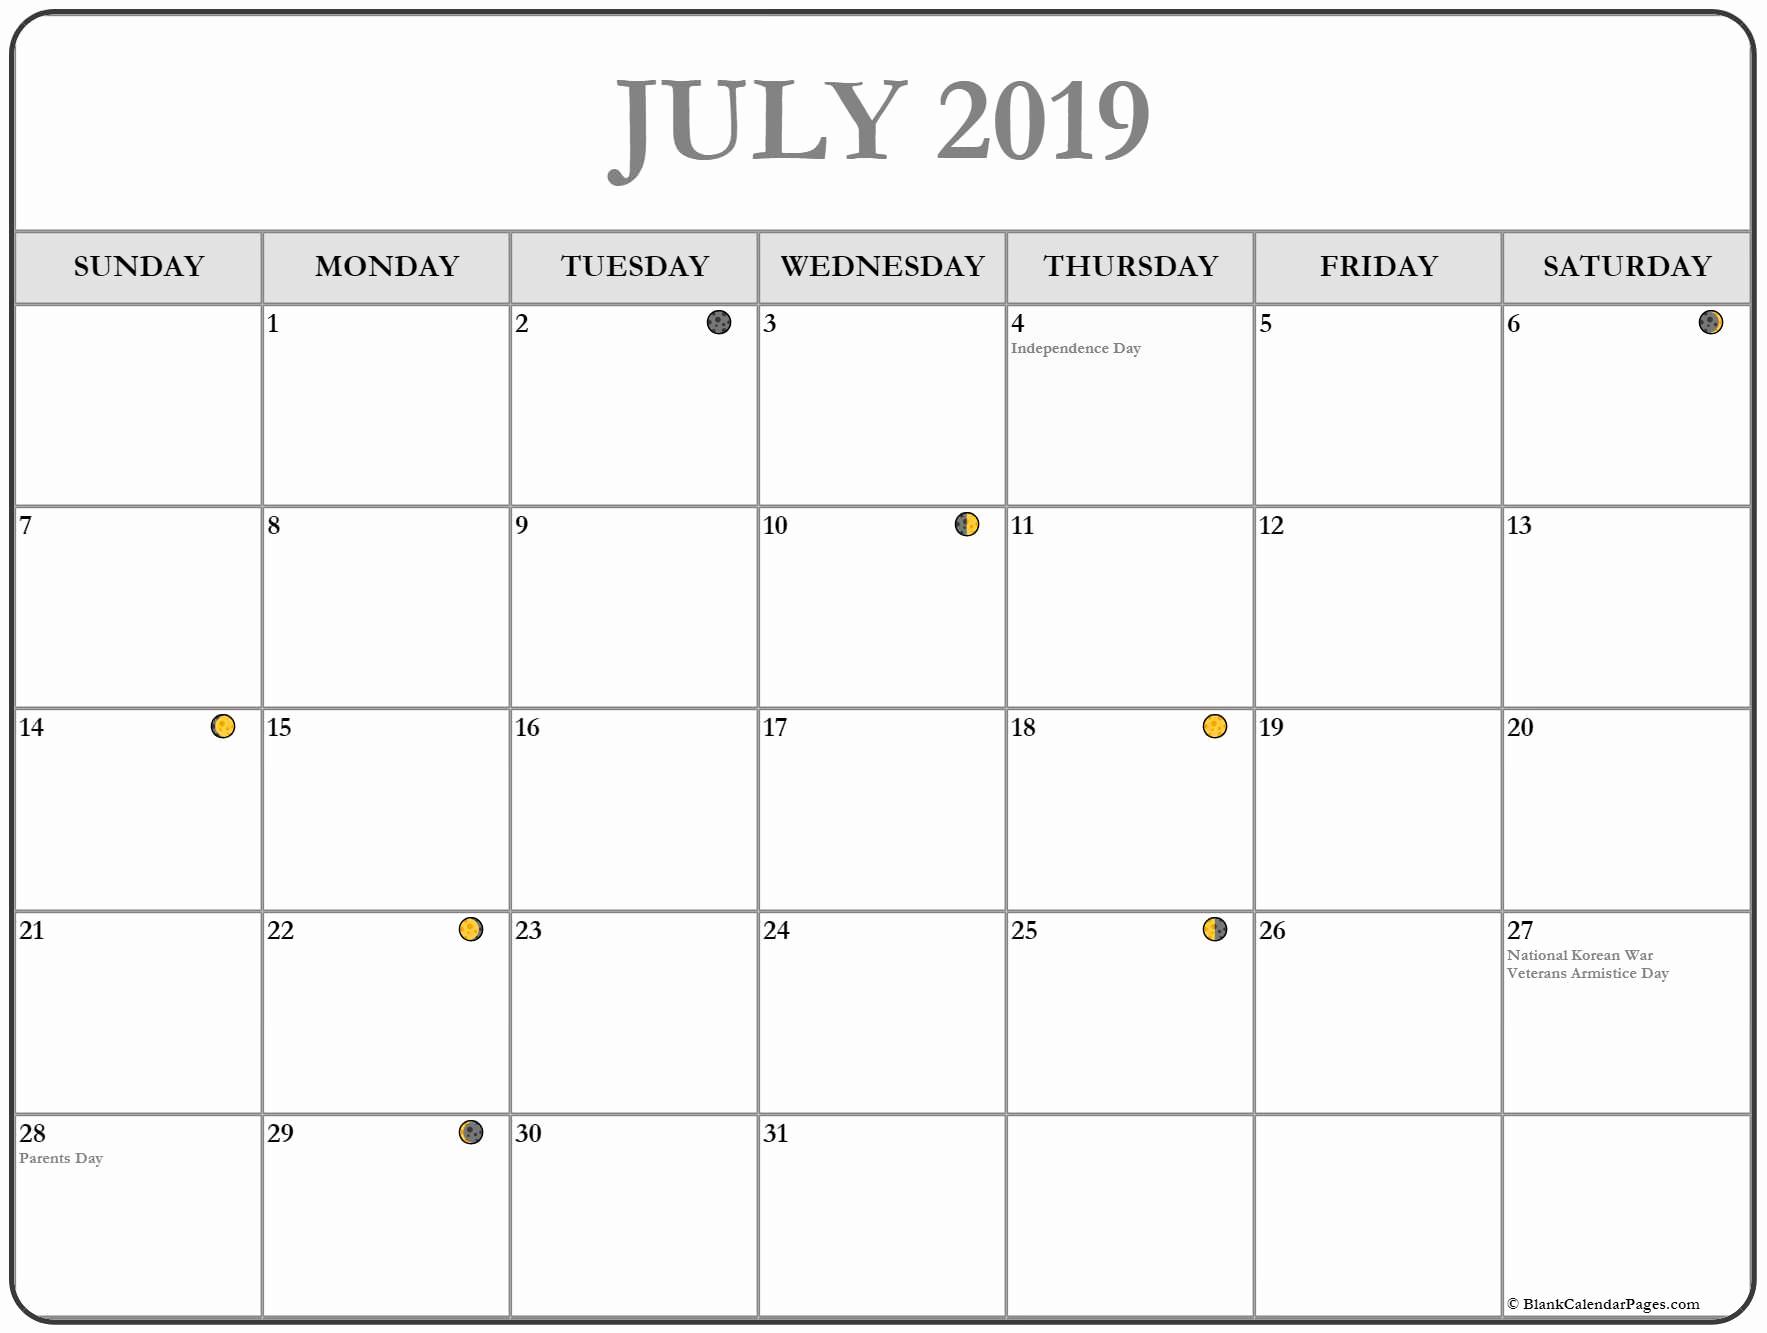 Printable Moon Calendar July 2019 - Free August 2019 Calendar within Template For Lunar Calendar